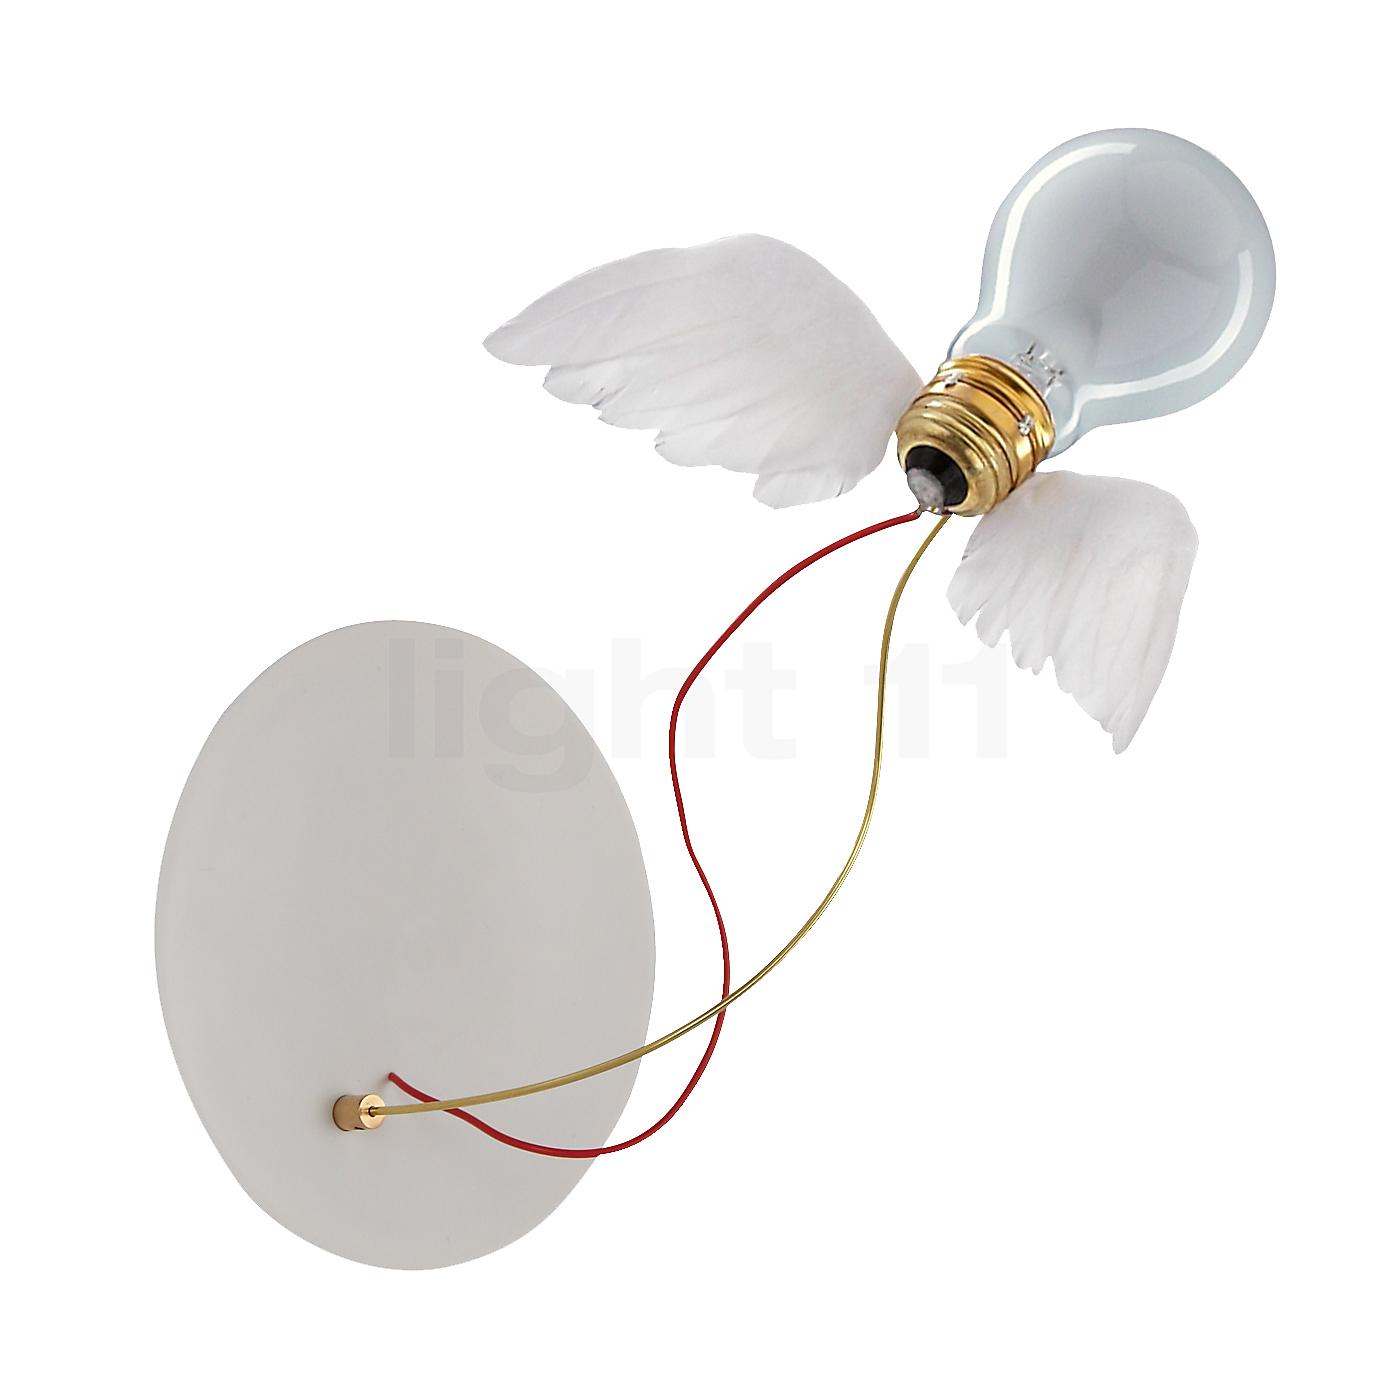 ingo maurer lucellino without transformator wall lights lamps lights. Black Bedroom Furniture Sets. Home Design Ideas